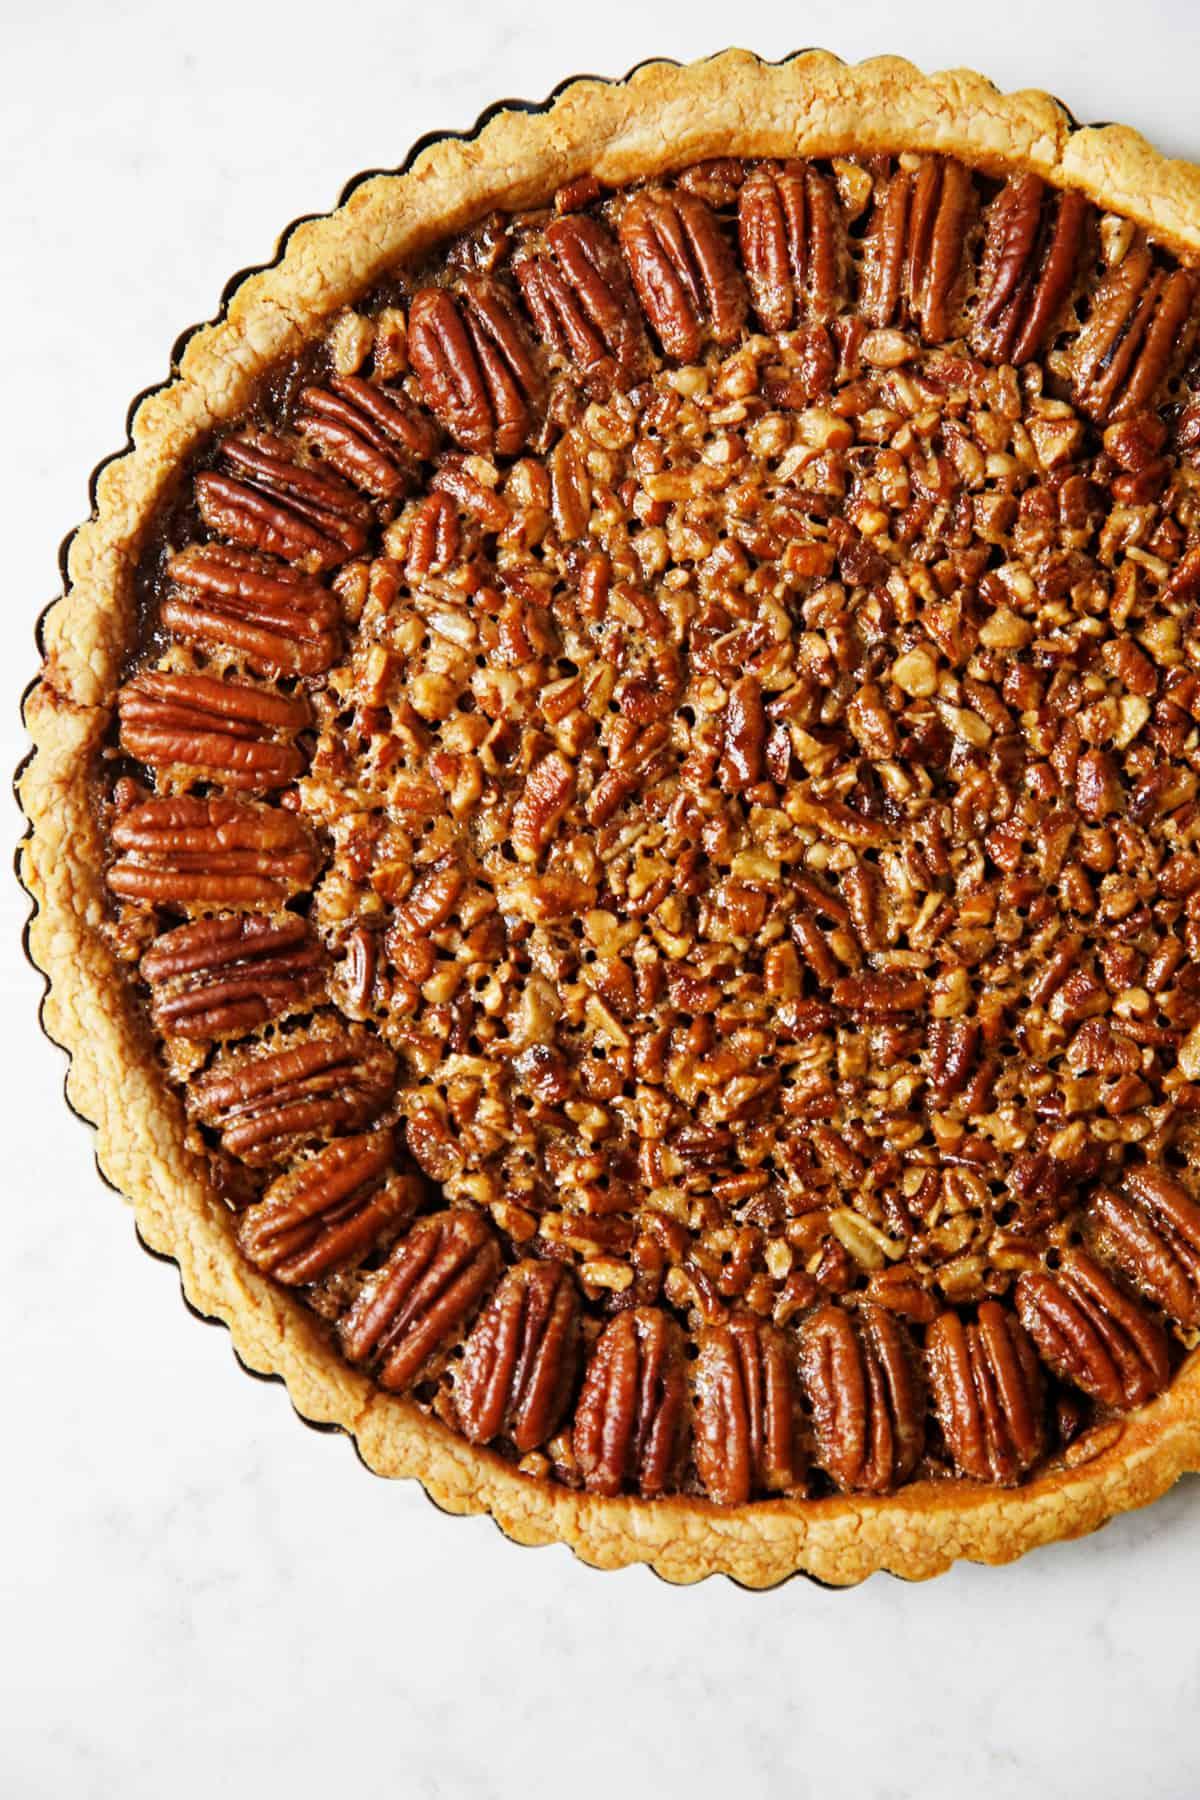 Decorated Gluten Free Pecan Pie